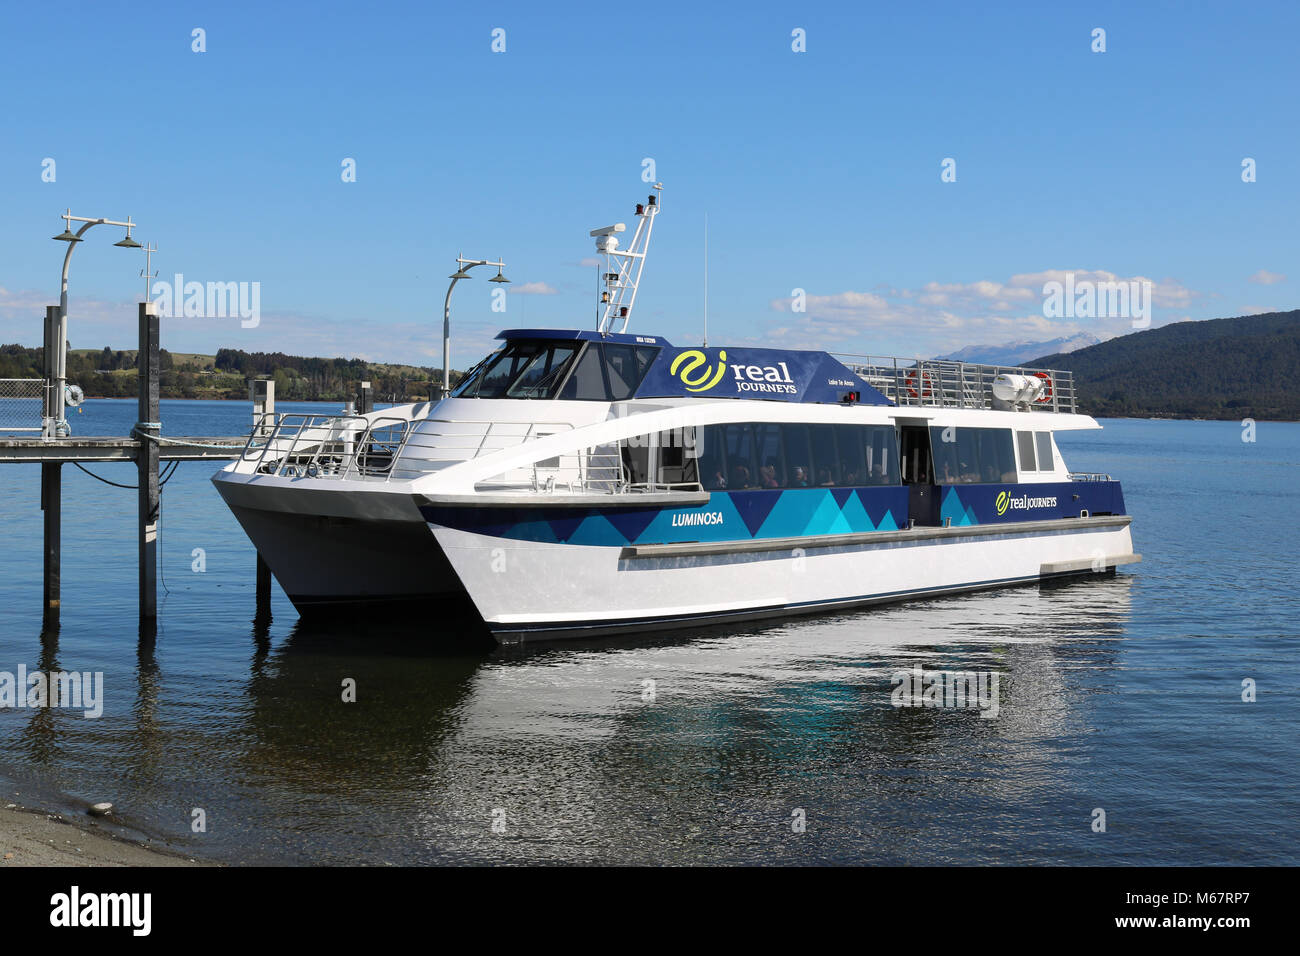 Catamaran cruise boat Luminosa operated by Real Journeys for cruises on lake Te Anau in Fiordland, South Island, - Stock Image